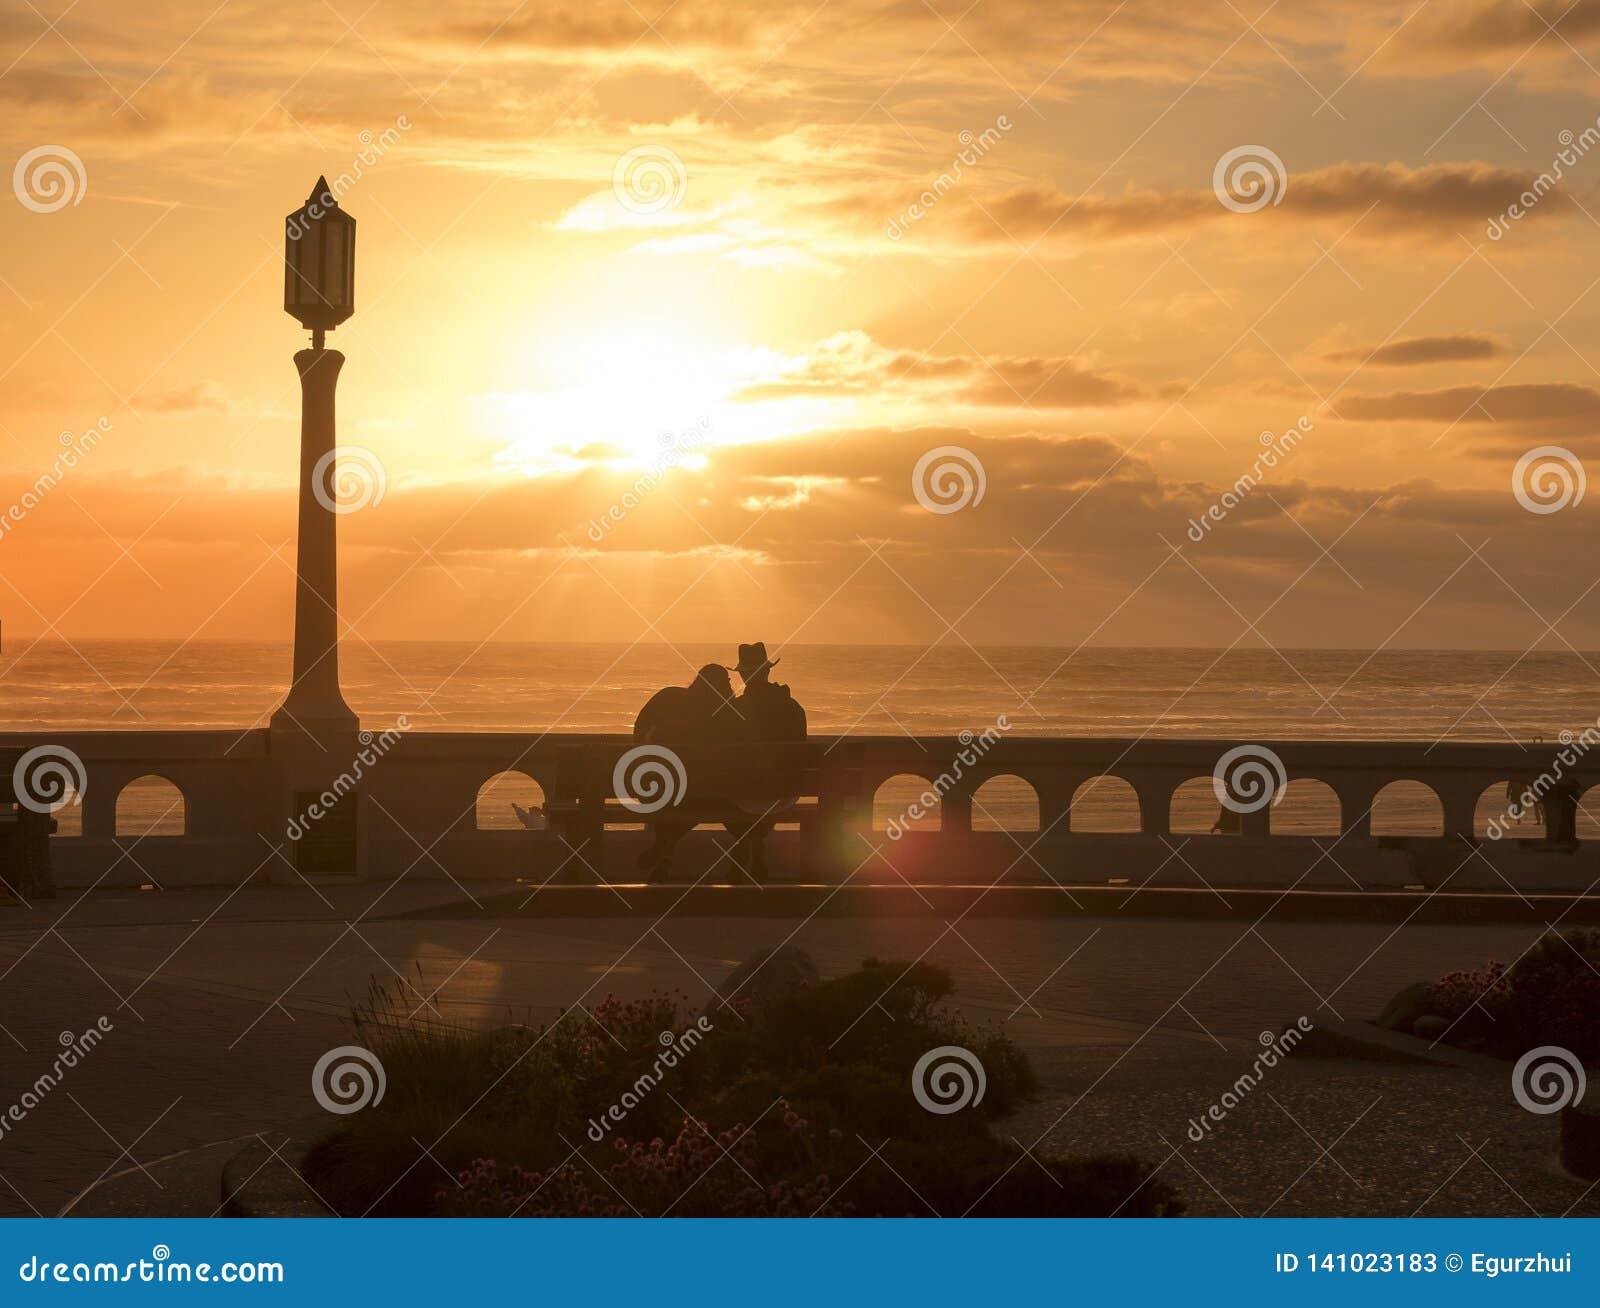 Молодой человек и женщина в любов сидя на стенде на seashore и наслаждаясь красивым заходом солнца